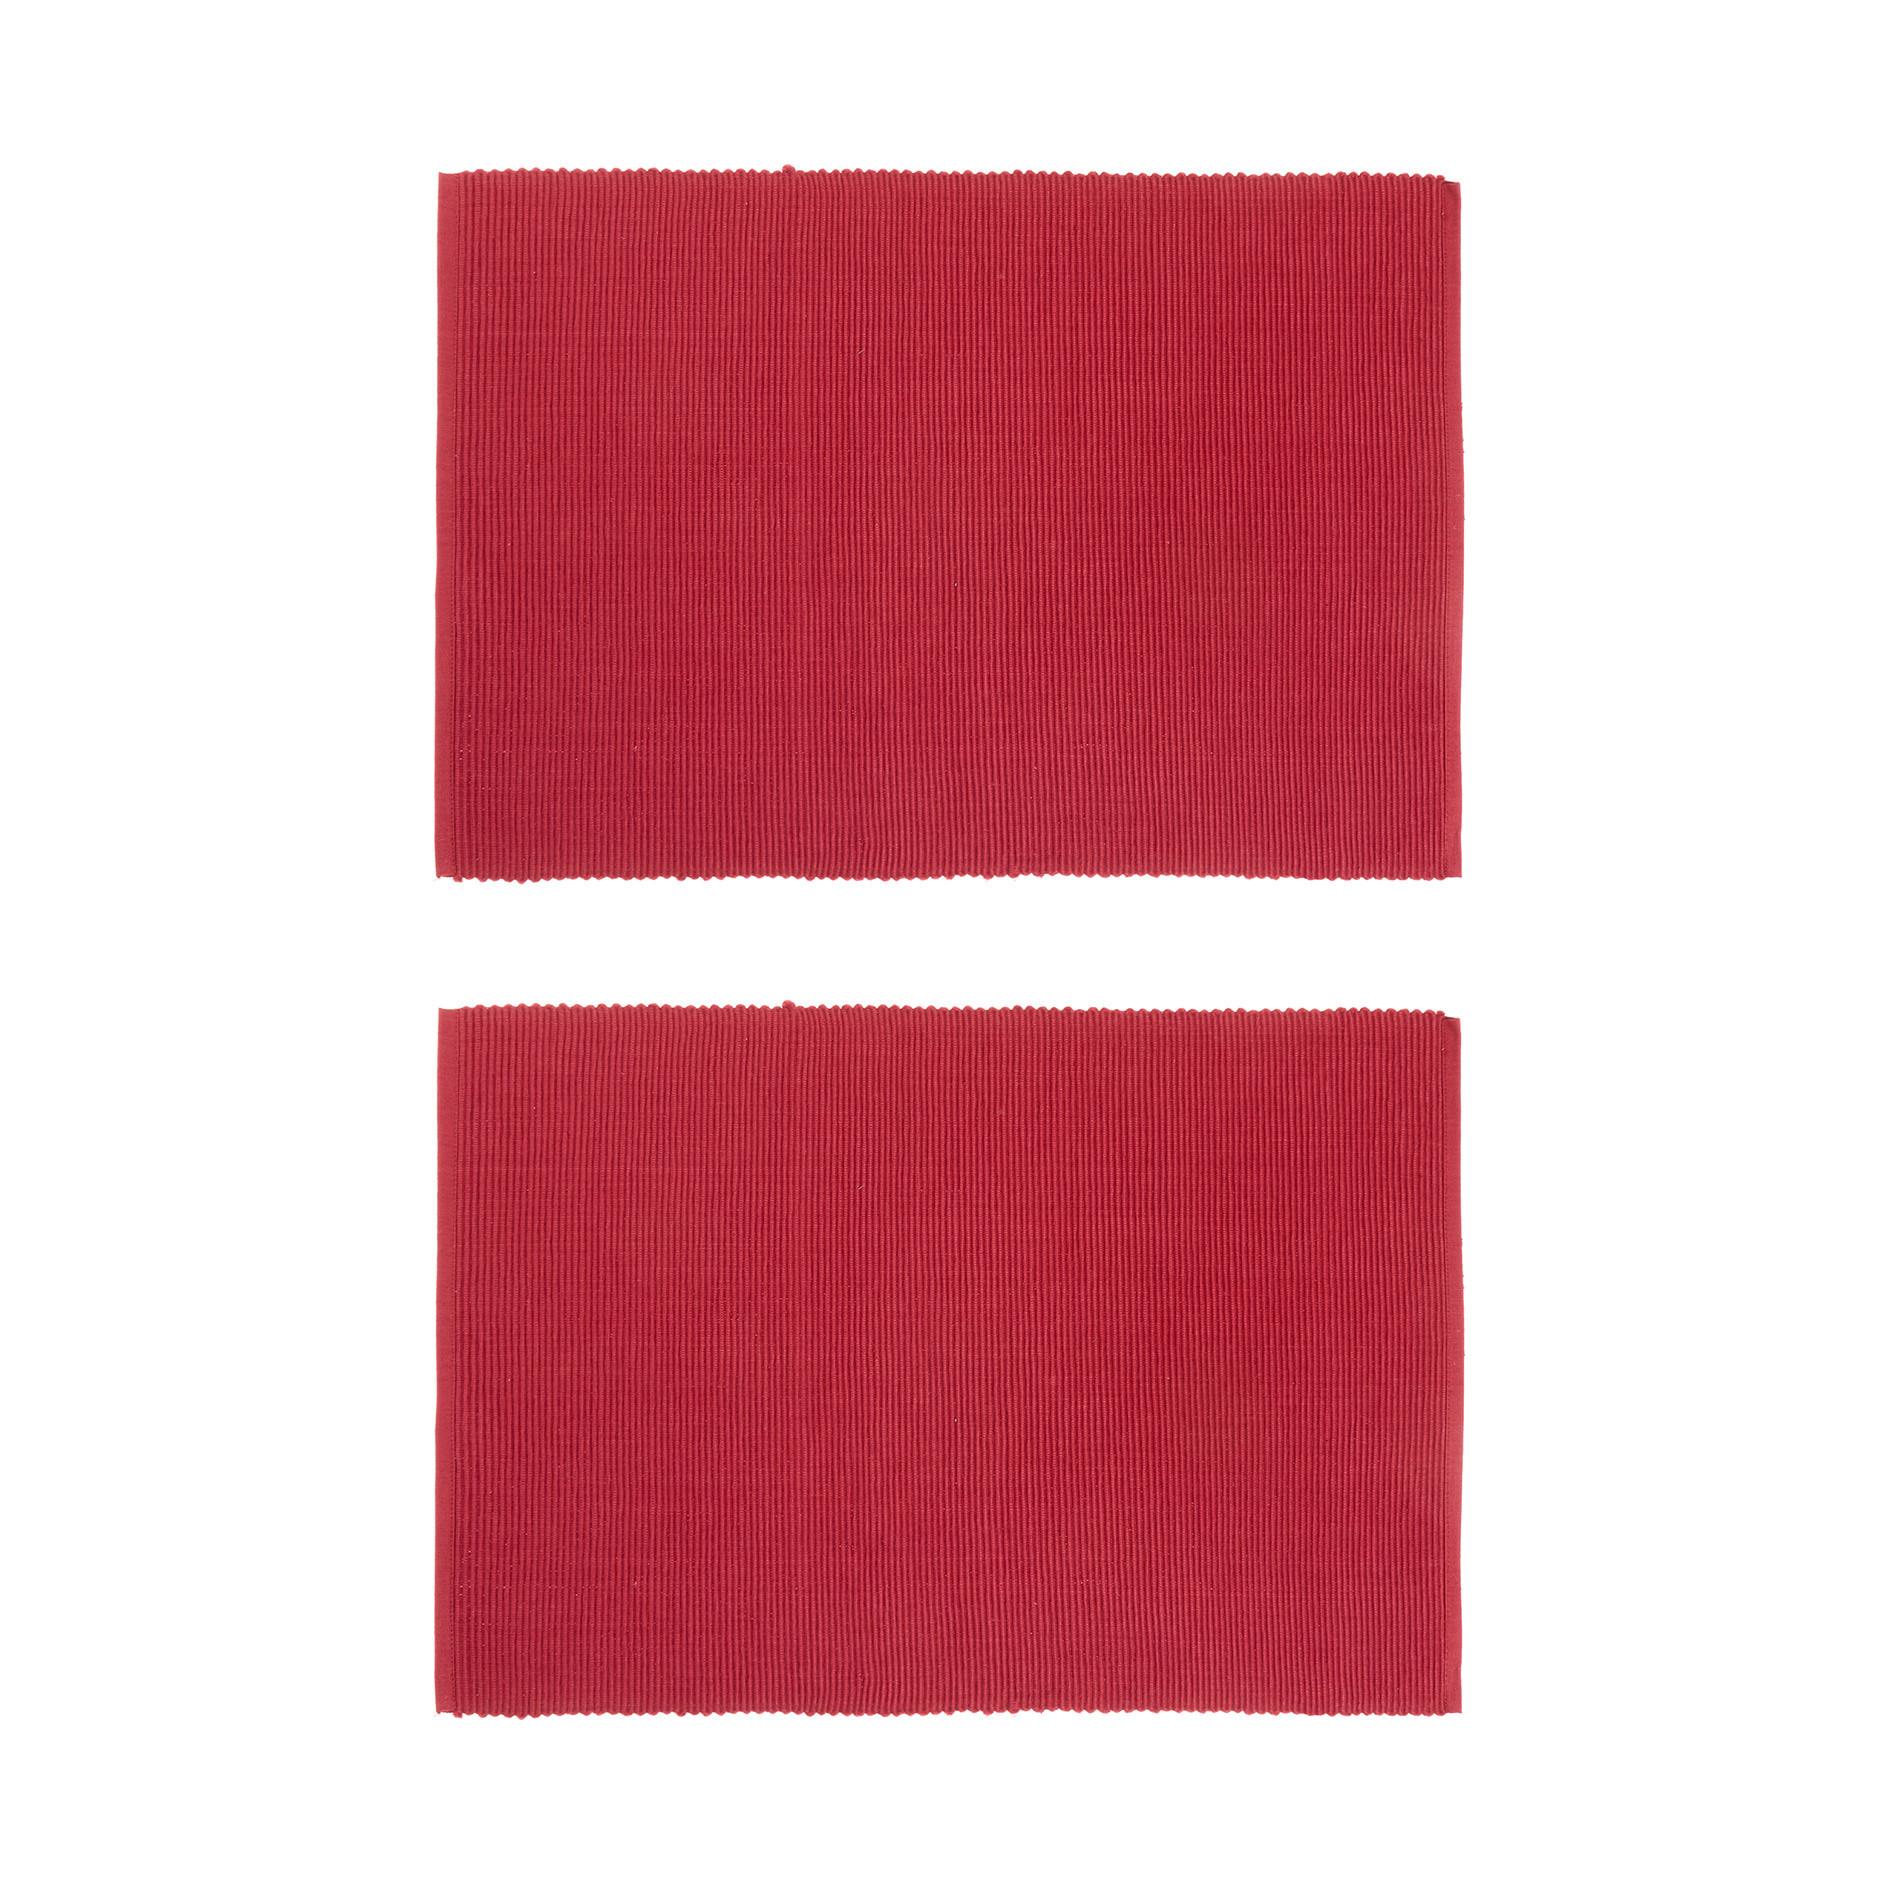 Set 2 tovagliette puro cotone tinta unita, Rosso, large image number 0